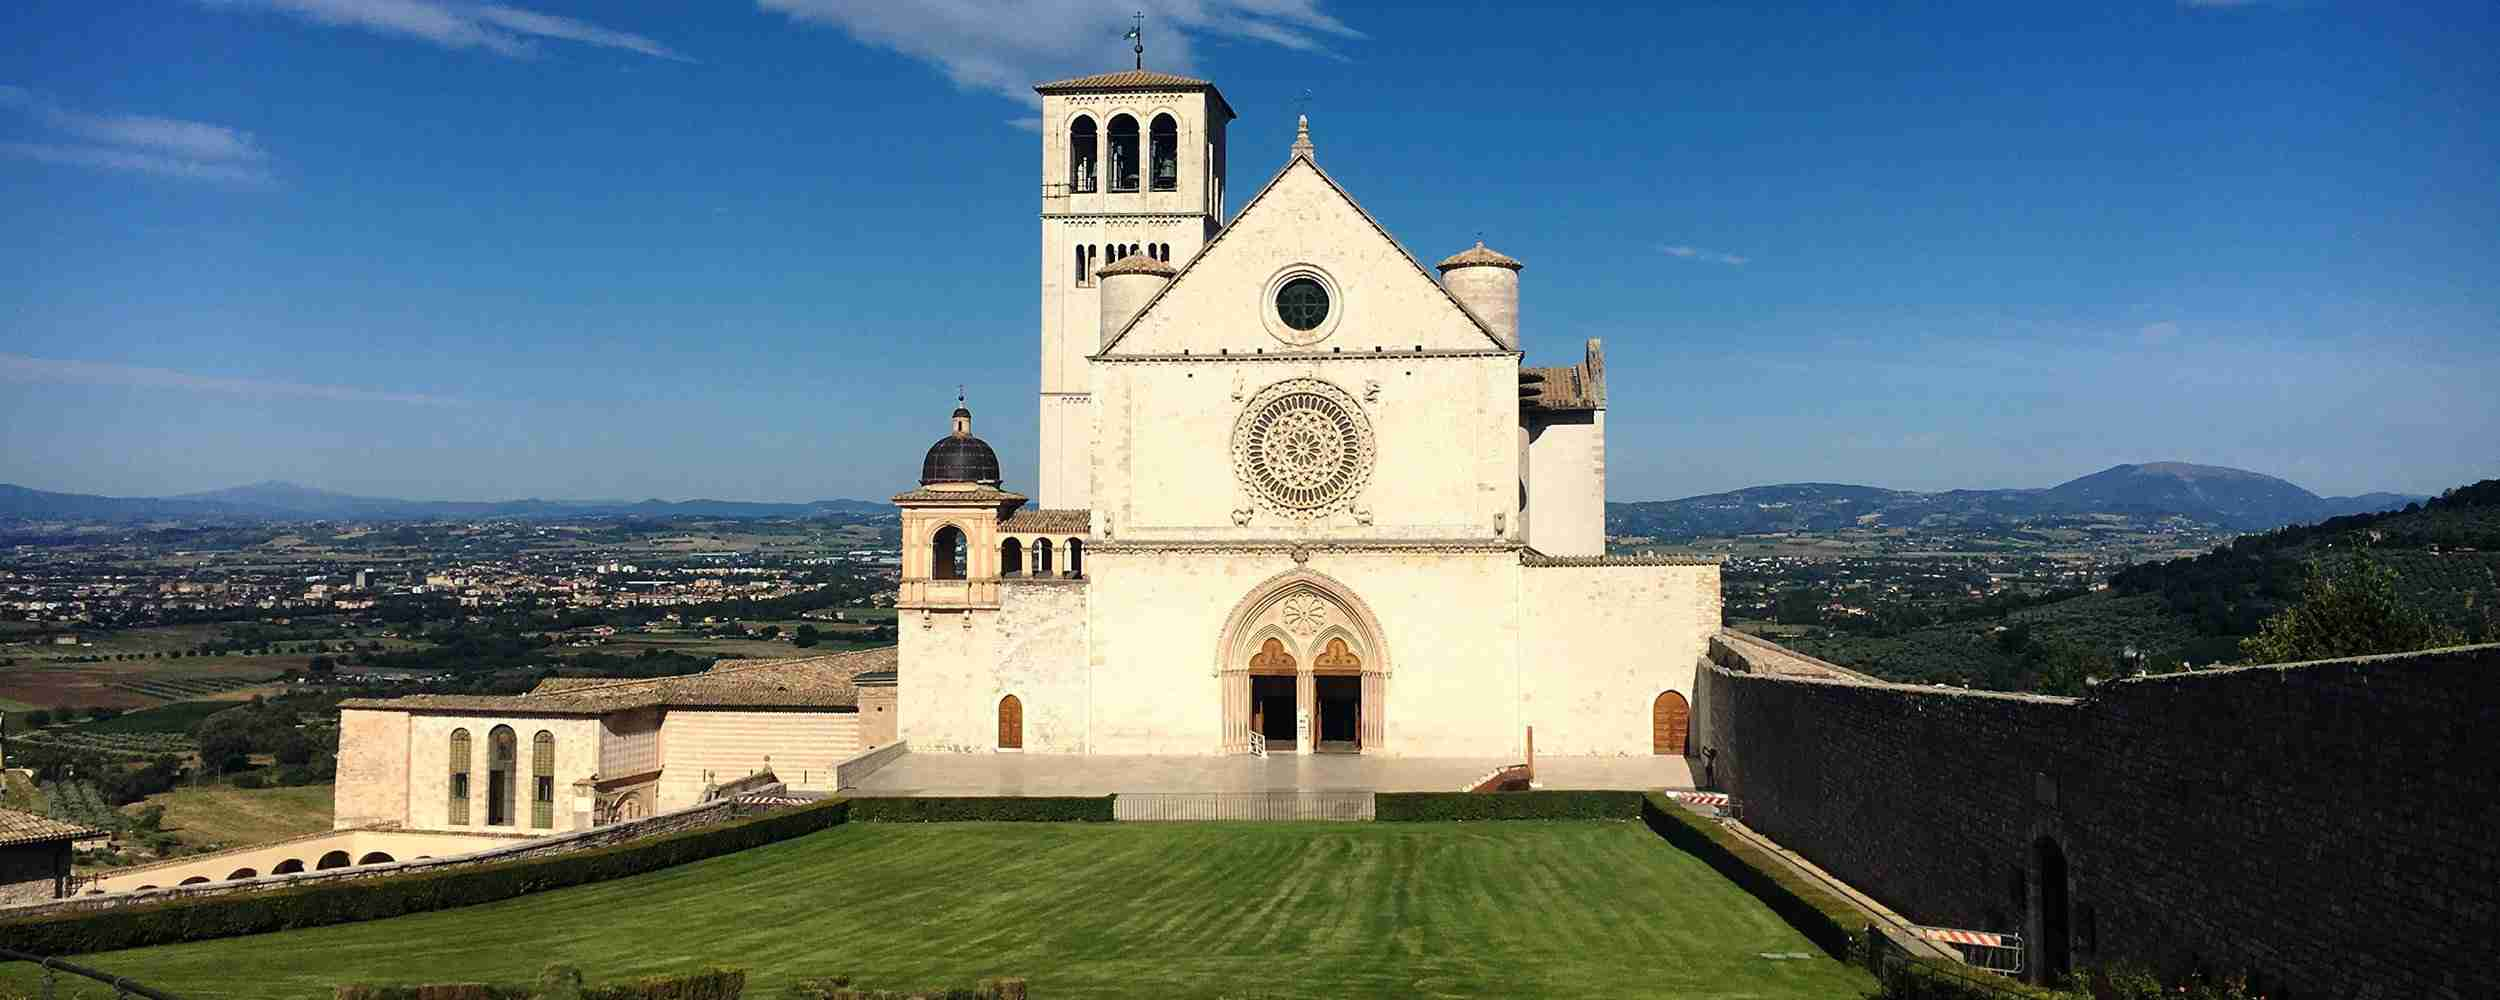 Visita guidata ad Assisi da Roma